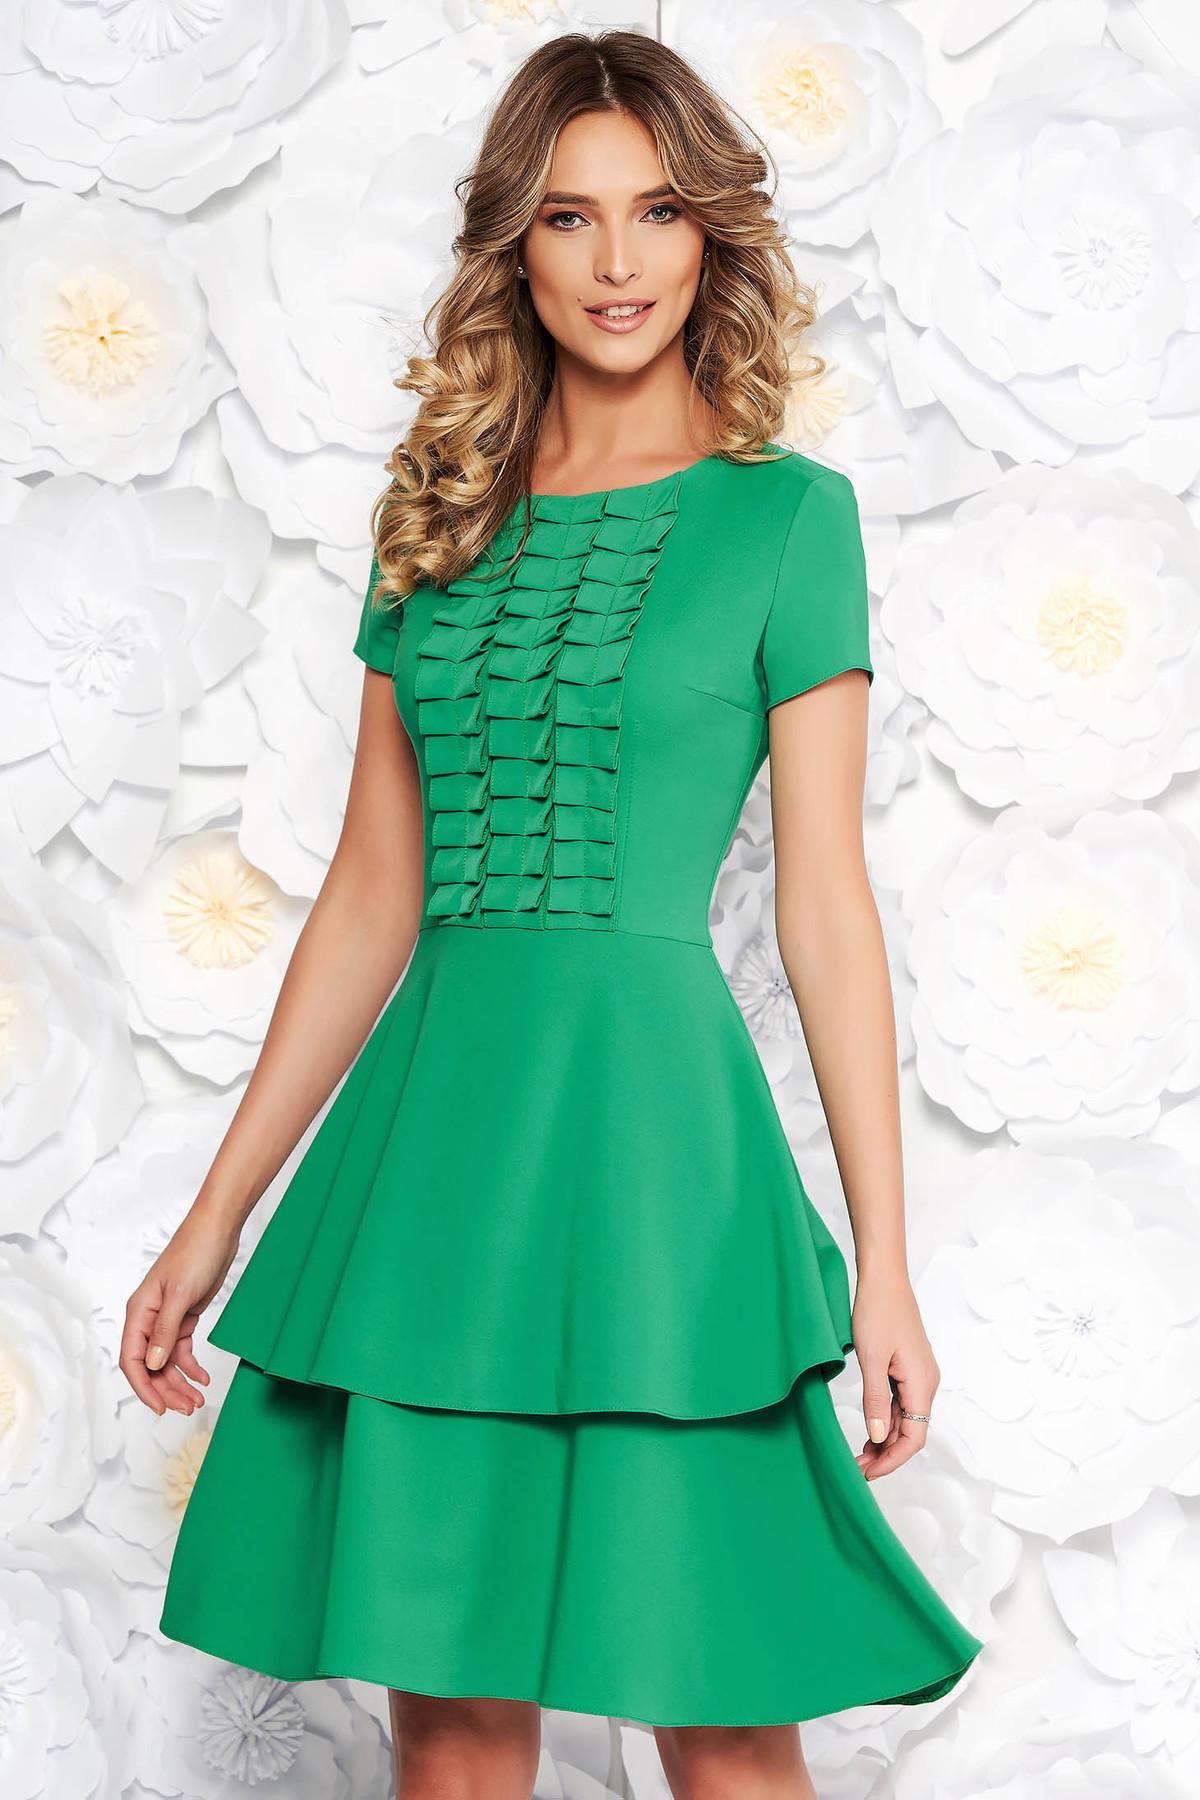 Rochie LaDonna verde de zi in clos din stofa subtire usor elastica cu maneci scurte cu volanase